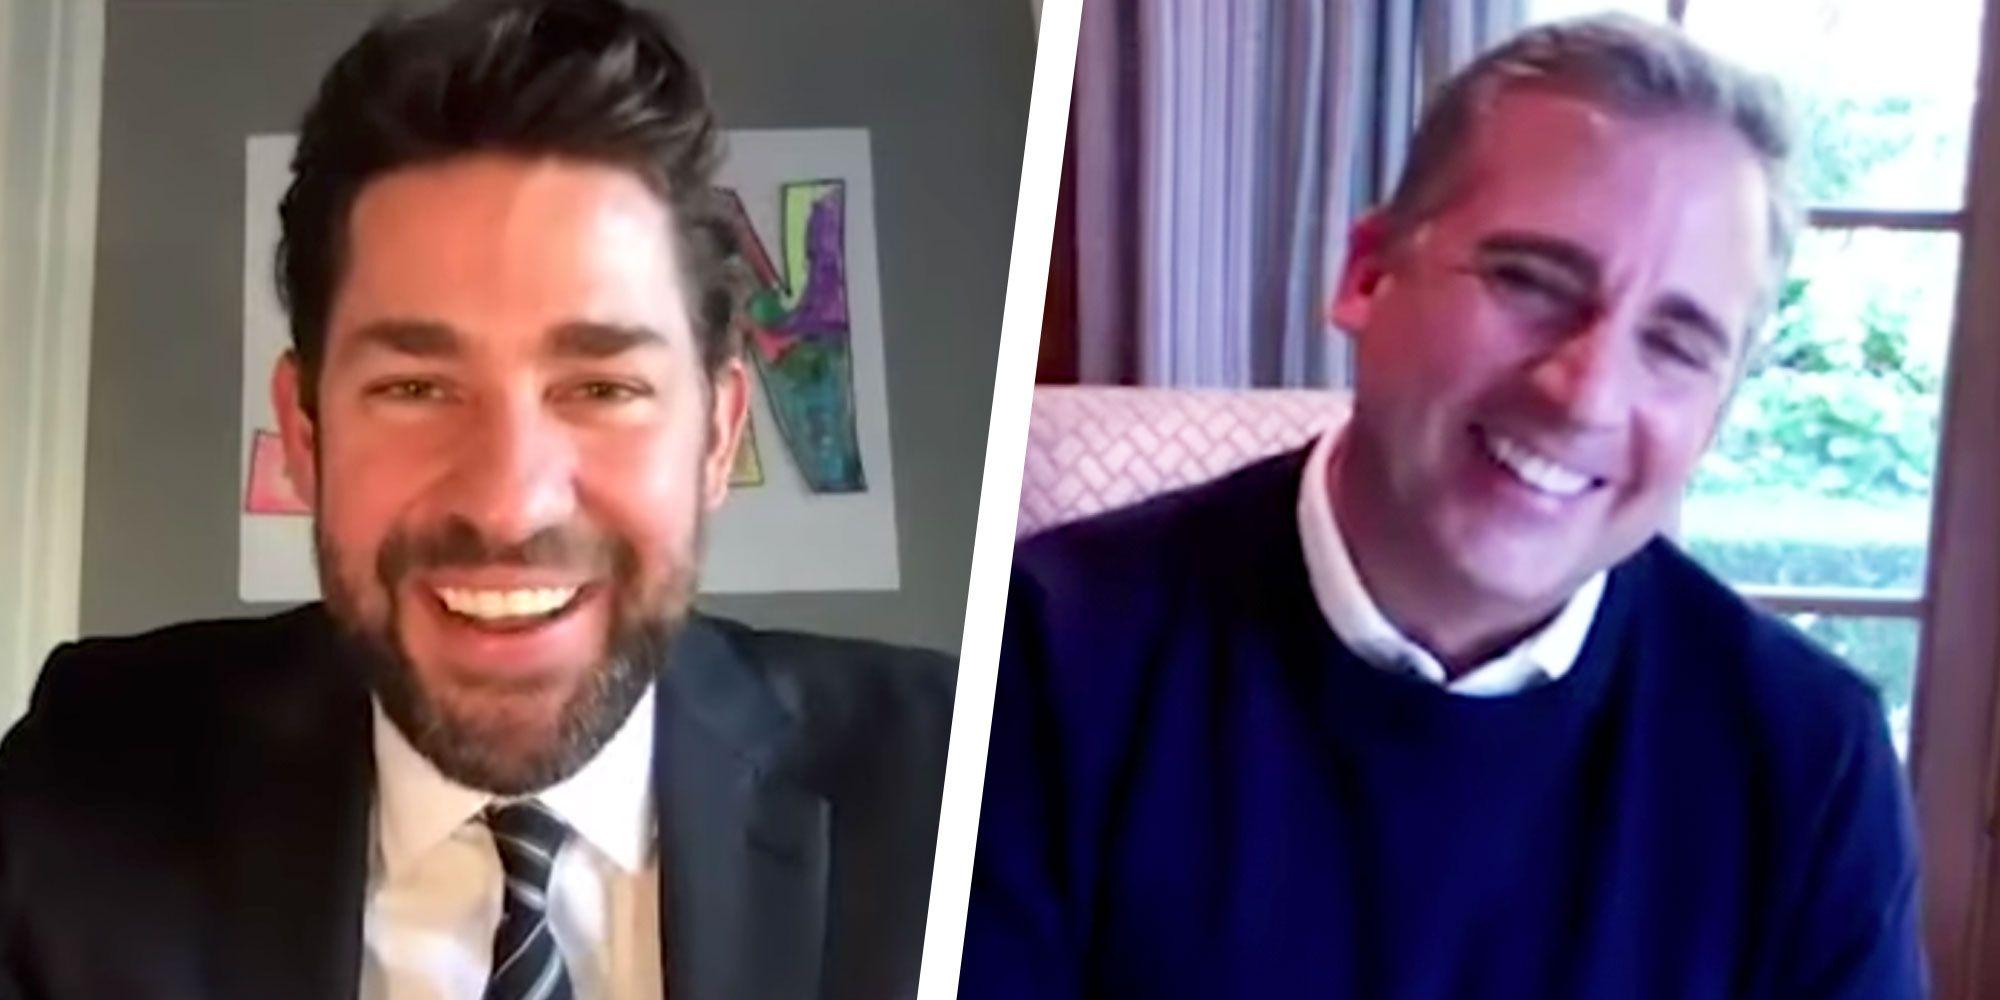 John Krasinski and Steve Carell Reunite Virtually for an Office Reunion